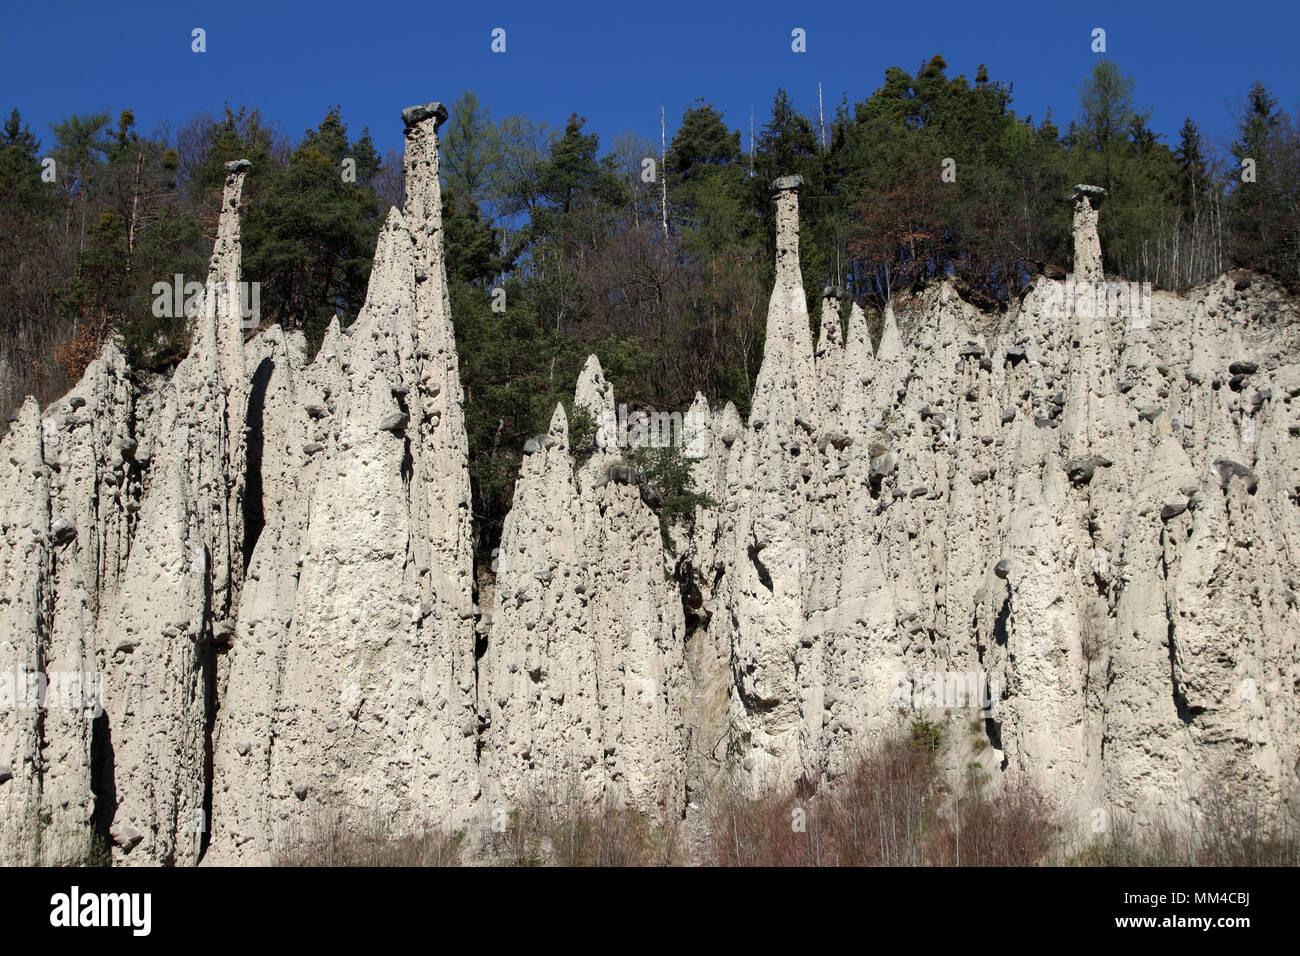 Earth Pyramids Gasteinergraben Unterinn Ritten South Tyrol Alto Adige Italy Europe - Stock Image